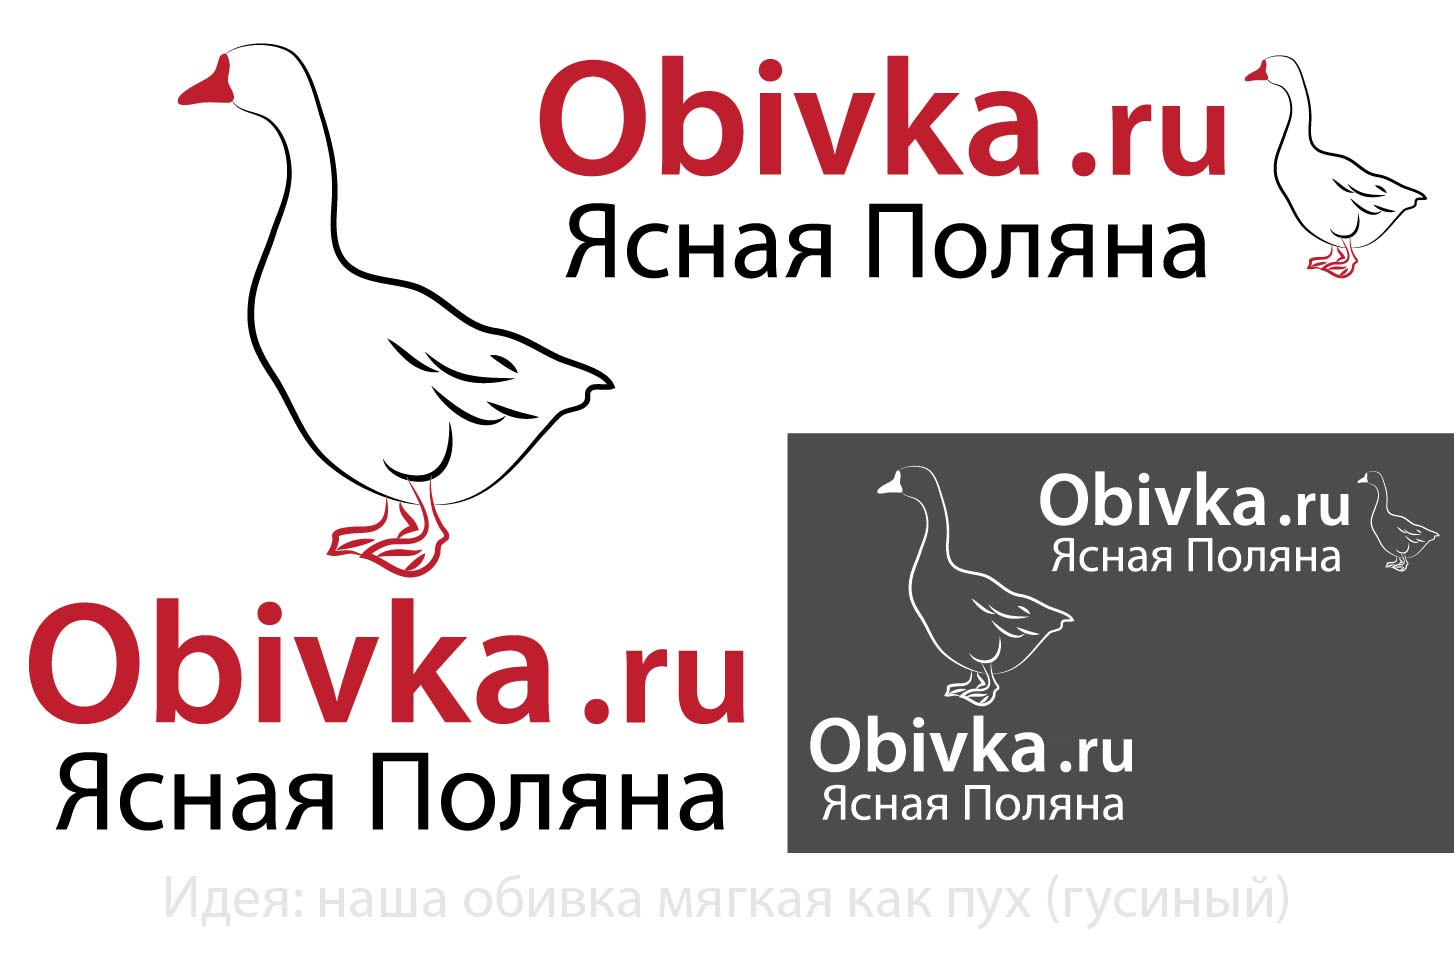 Логотип для сайта OBIVKA.RU фото f_0325c175ecf156d5.jpg